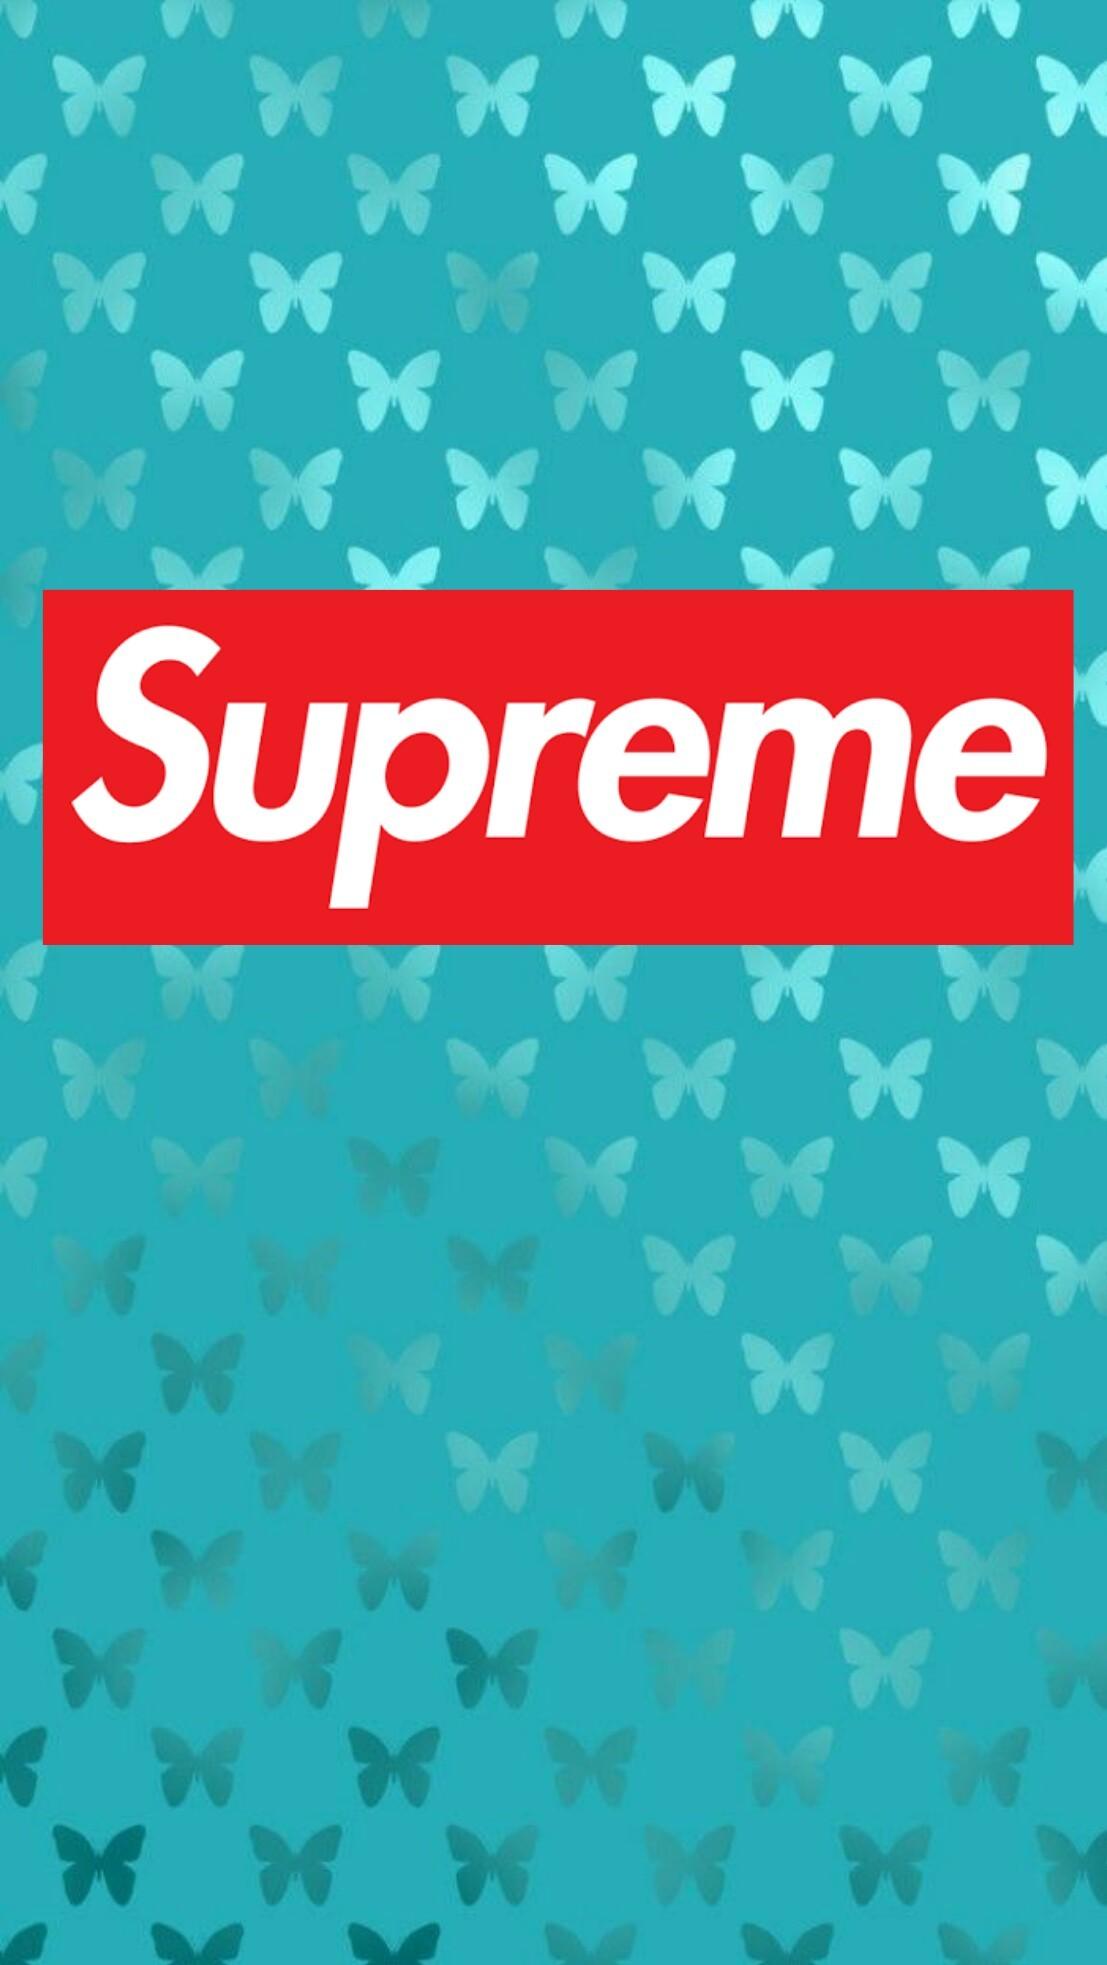 Supreme wallpaper Download High Resolution 1107x1965